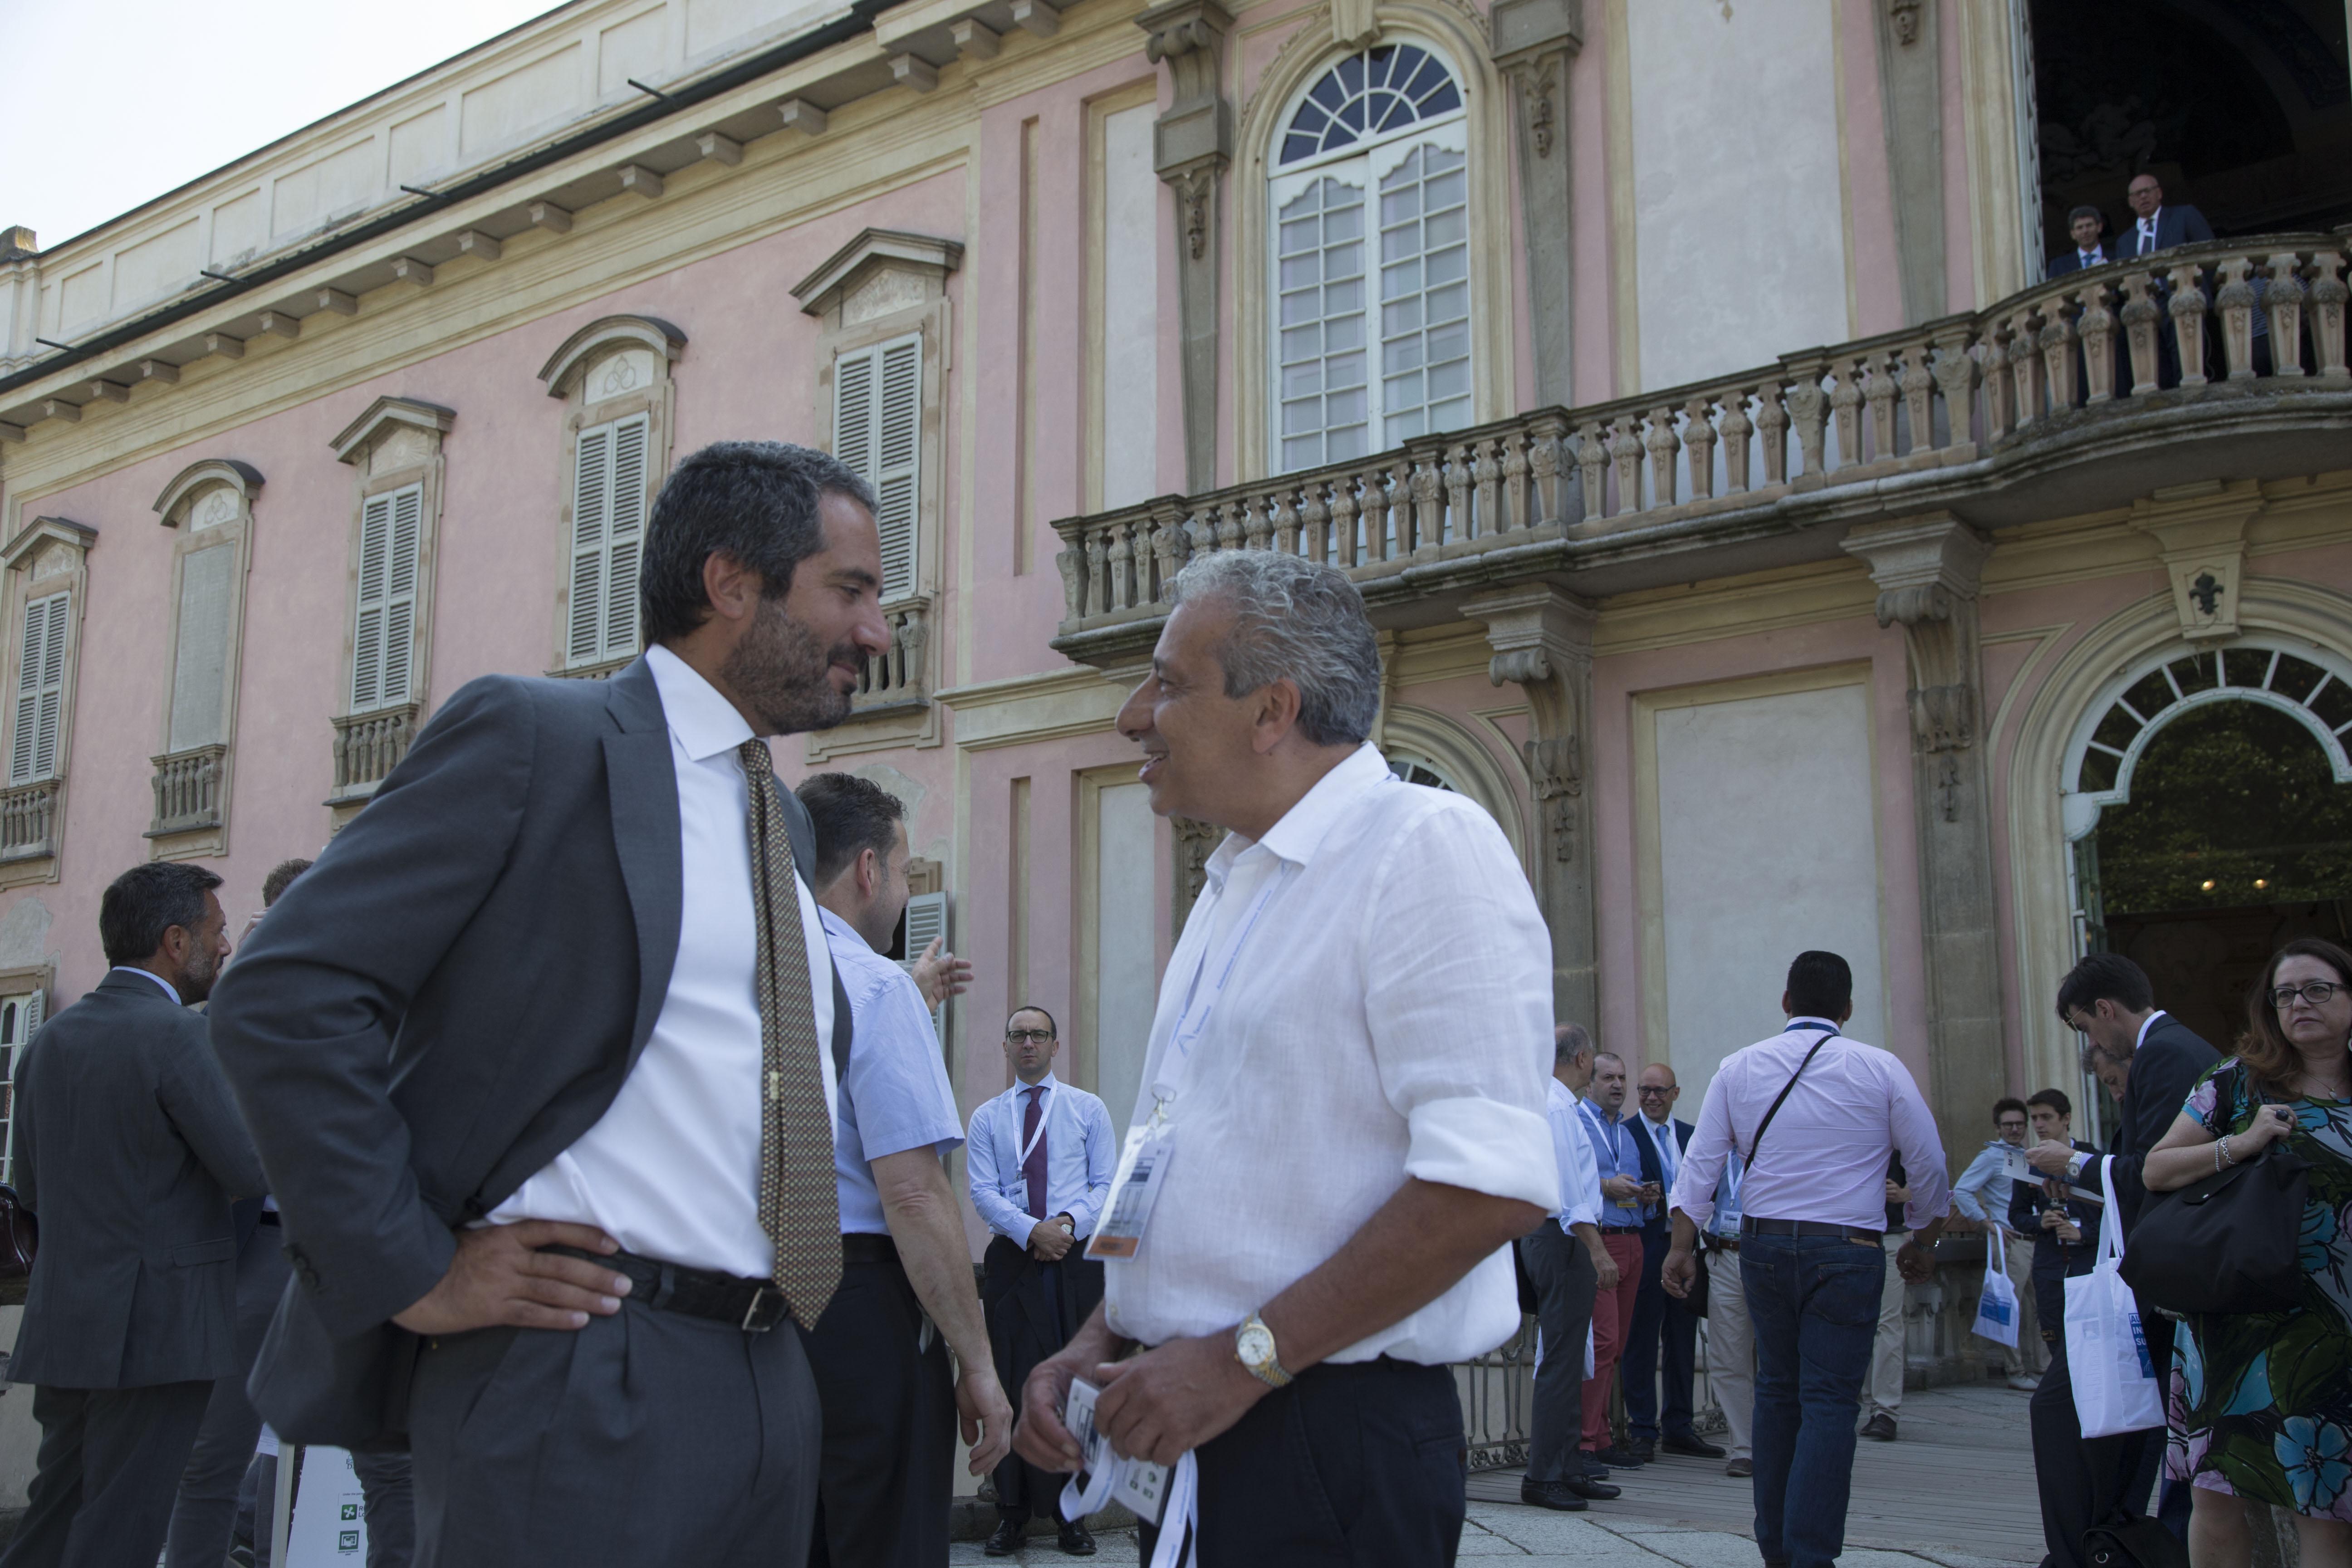 Pierroberto Folgiero, CEO di Maire Tecnimont (a sinistra) e Claudio Montresor, presidente AIS (a destra)